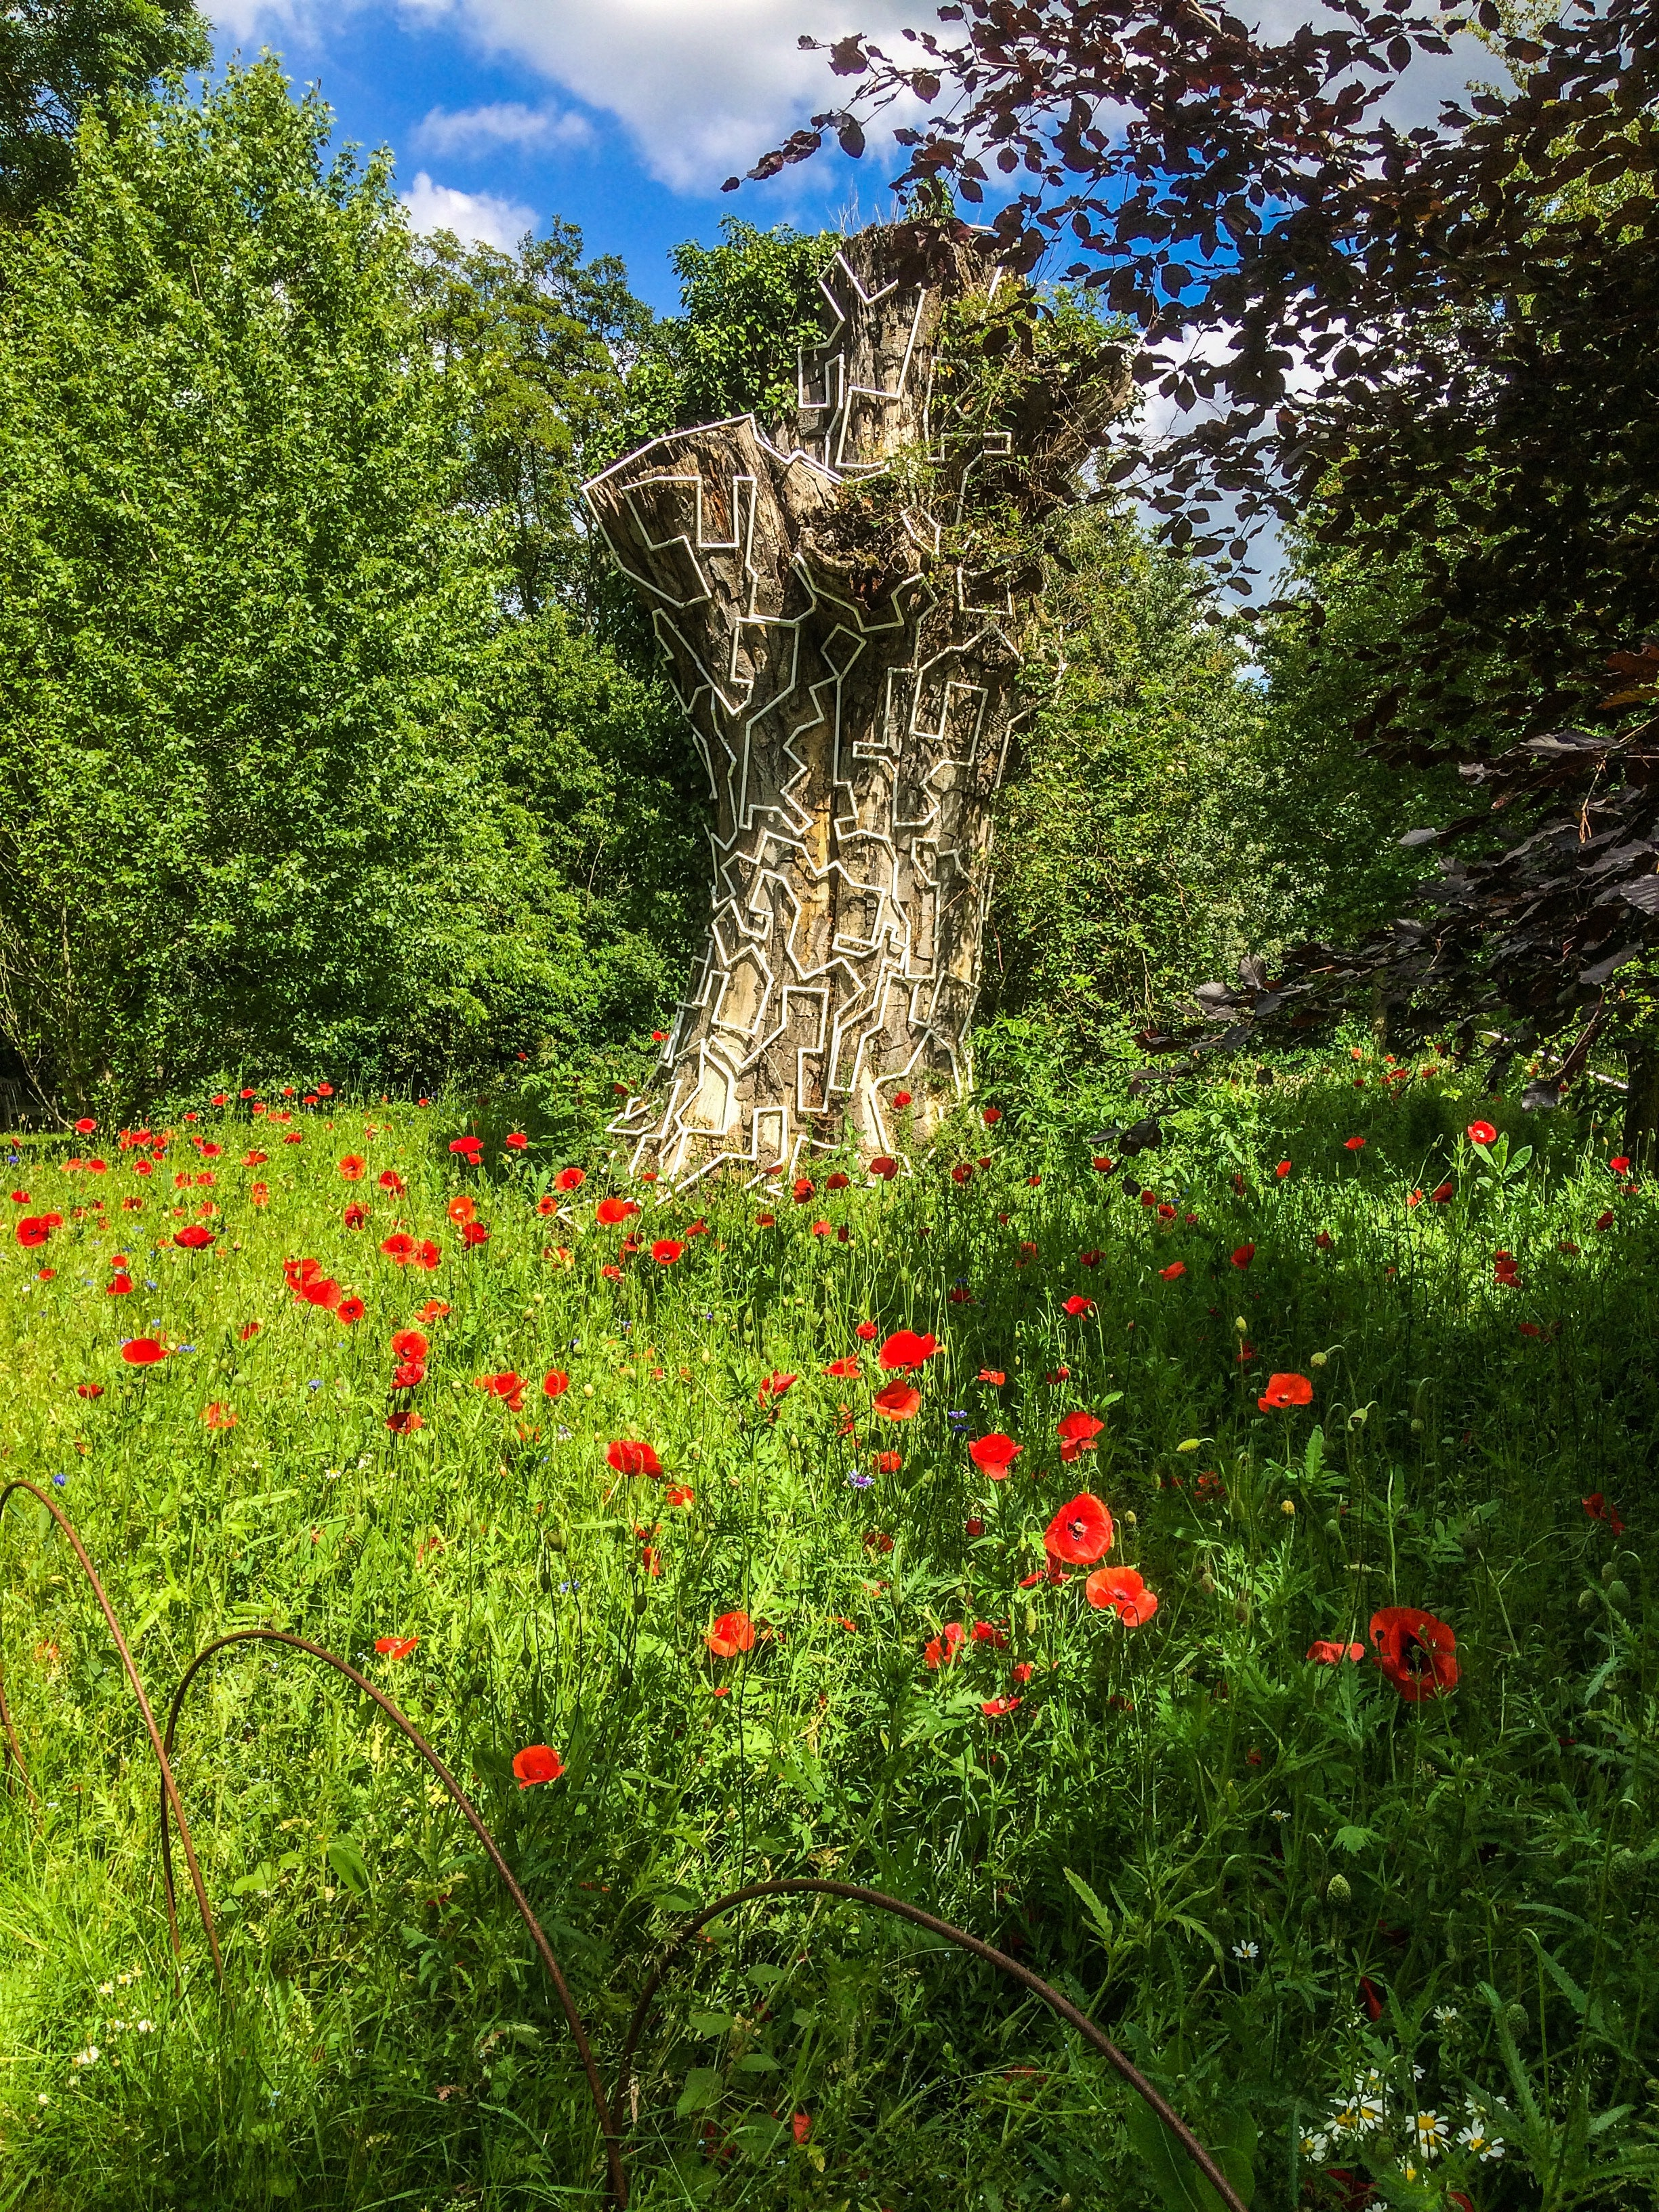 wild-poppies-gardens-poppies-3610631